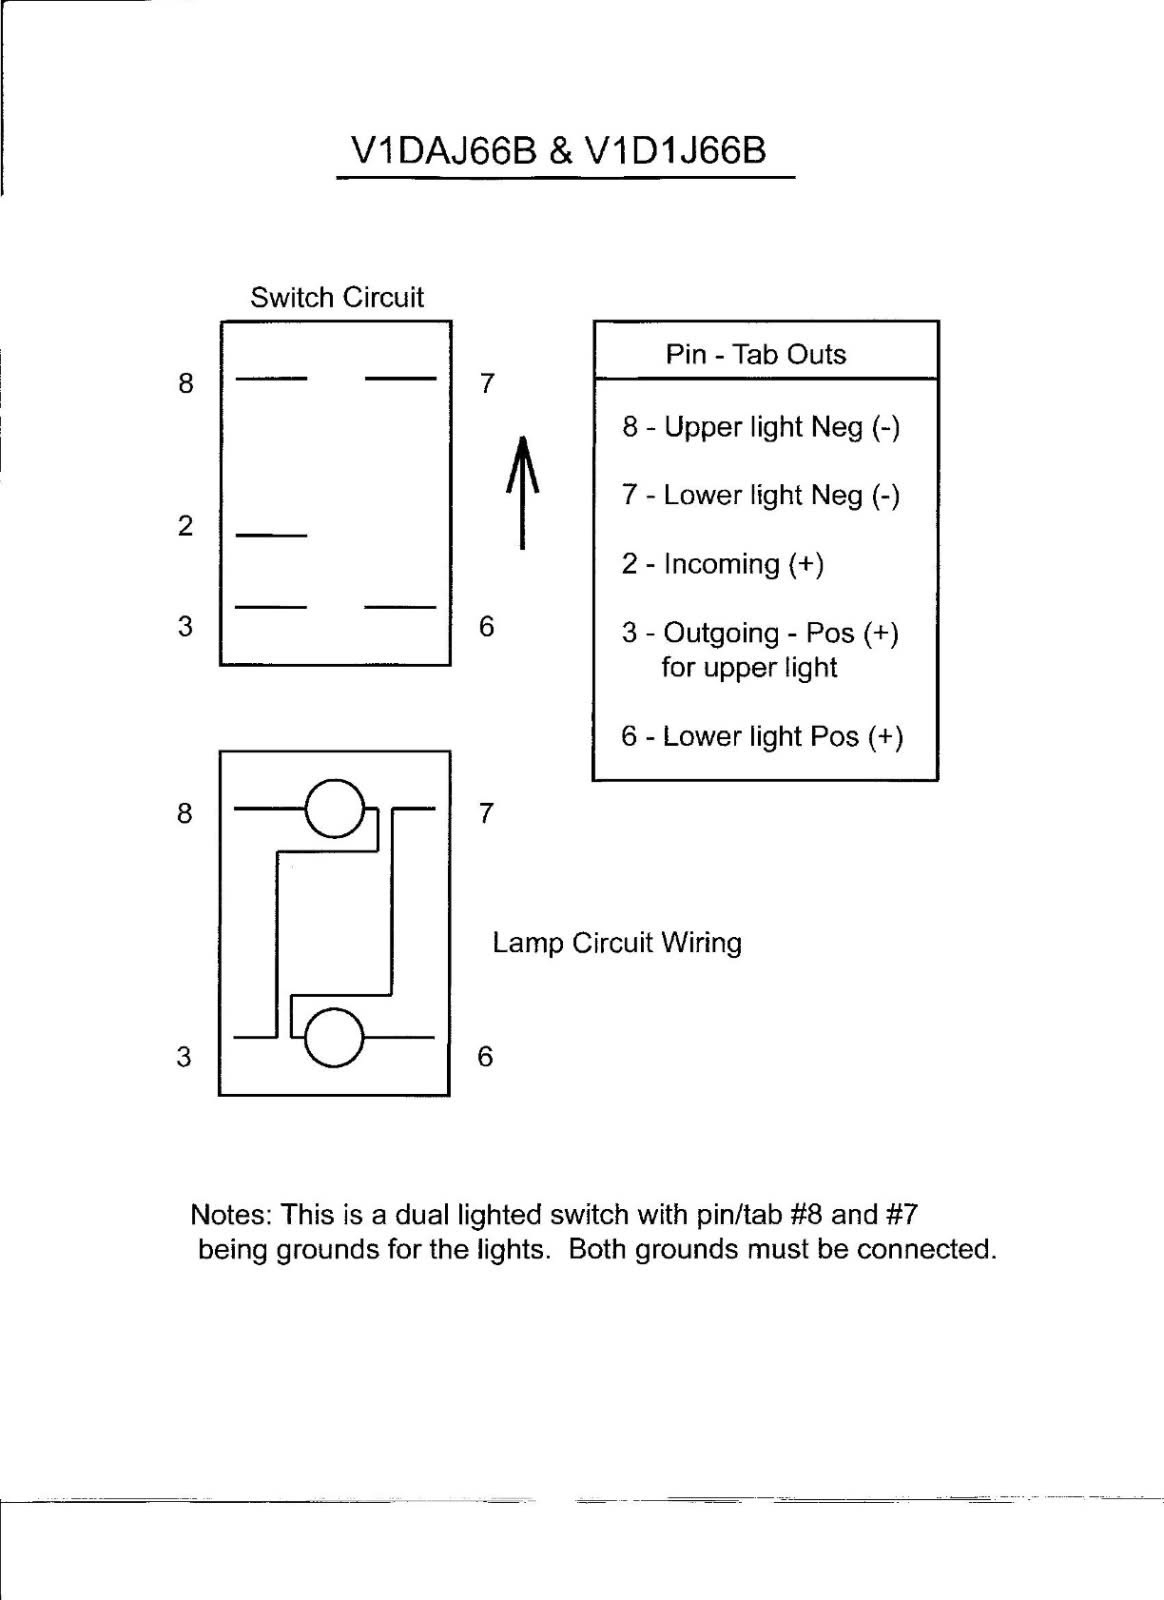 6 Pin toggle Switch Wiring Diagram | Free Wiring Diagram  Position Switches Wiring Diagram on wiring a switch from a switch, three way switches diagram, electrical switches diagram, three prong power cord diagram, electrical outlets diagram, switch diagram,